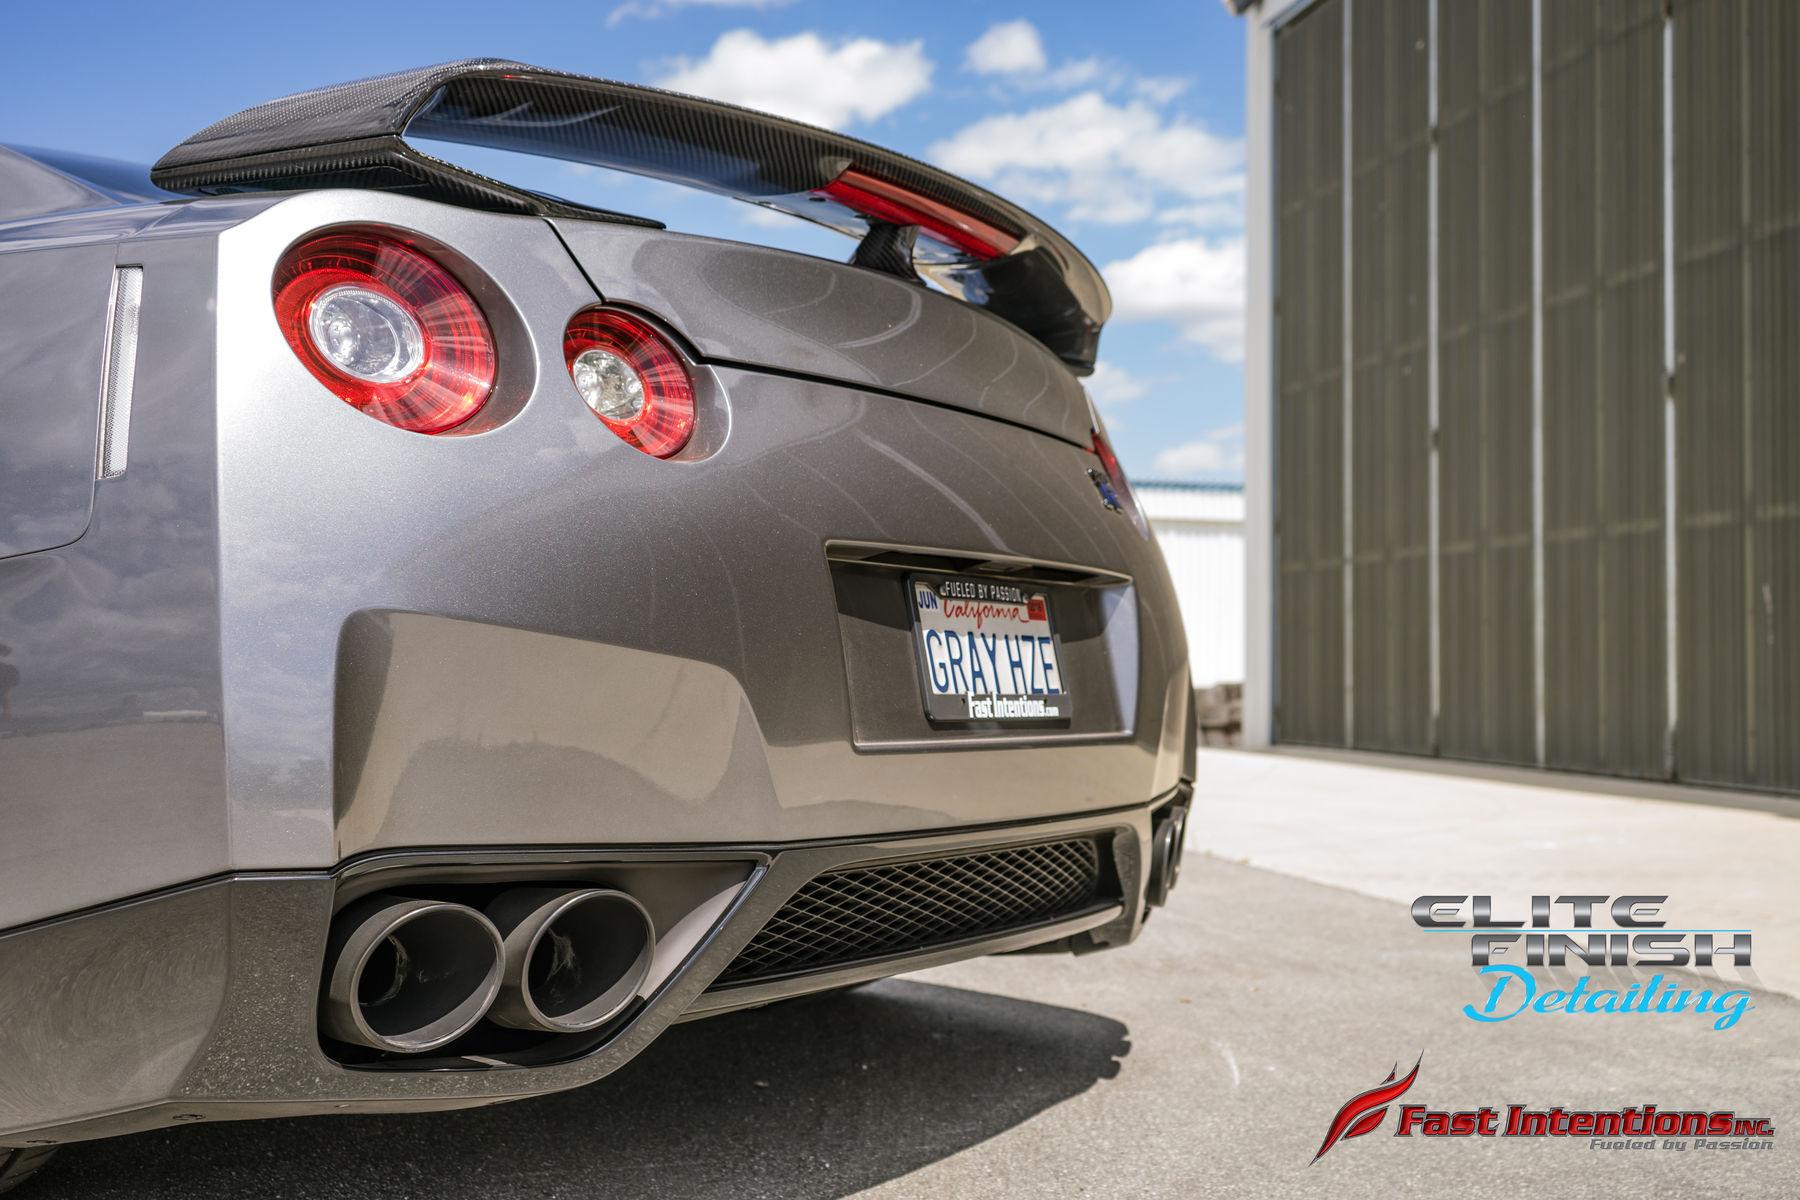 Nissan GT-R | Shift S3ctor California Airstrip Attack